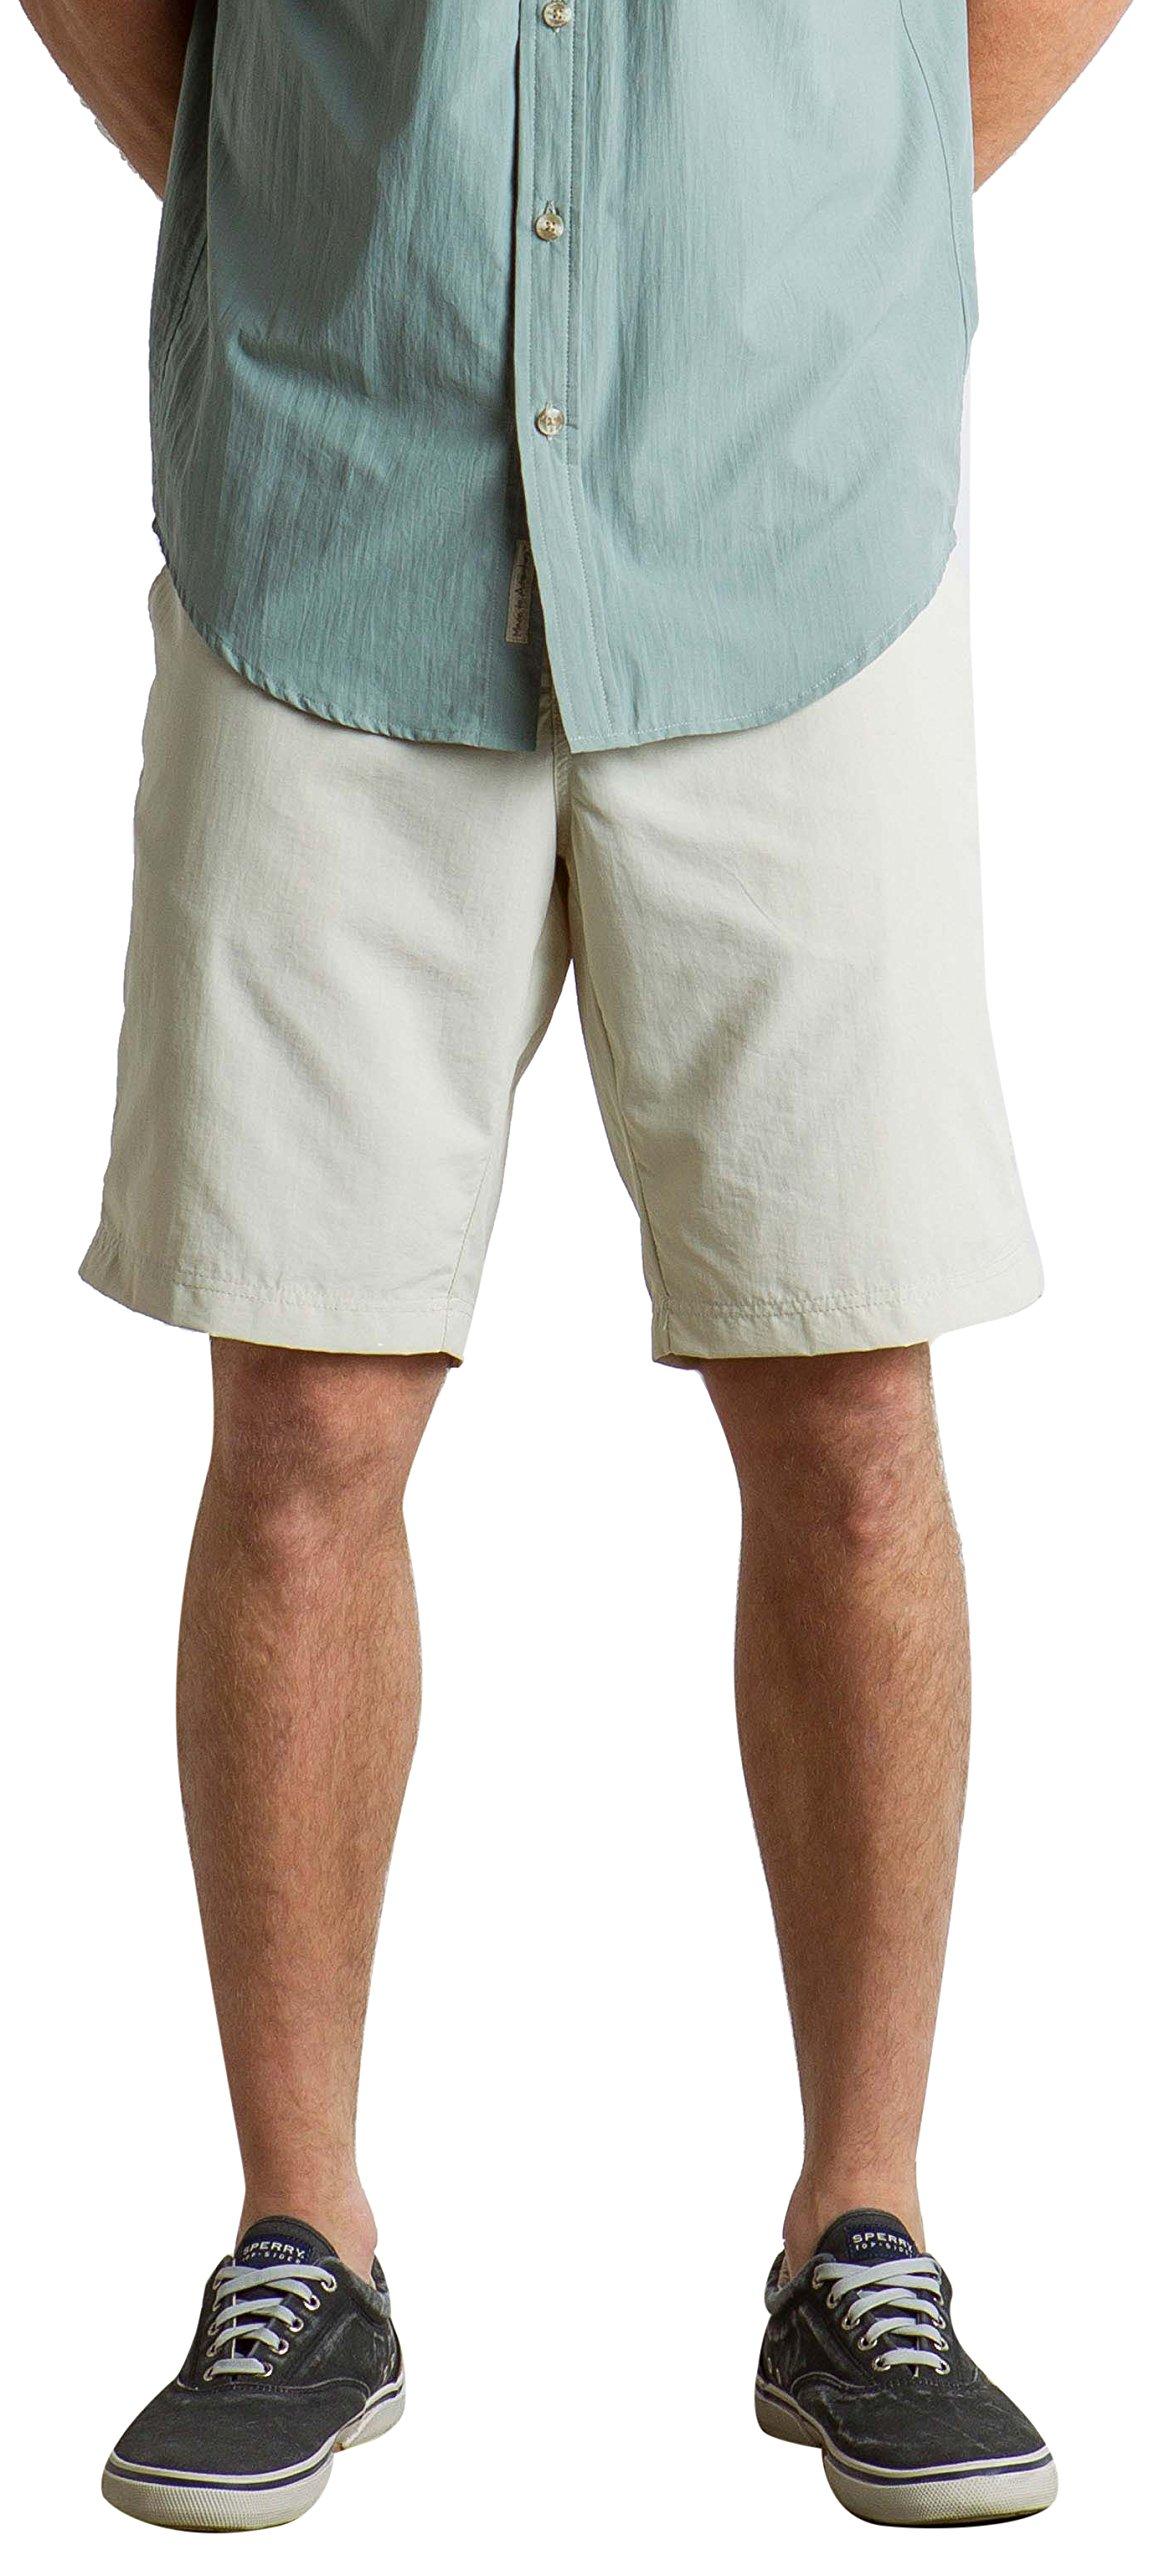 ExOfficio Men's Sol Cool Nomad Lightweight Quick-Dry Shorts, 10'', Light Stone, Size 38 by ExOfficio